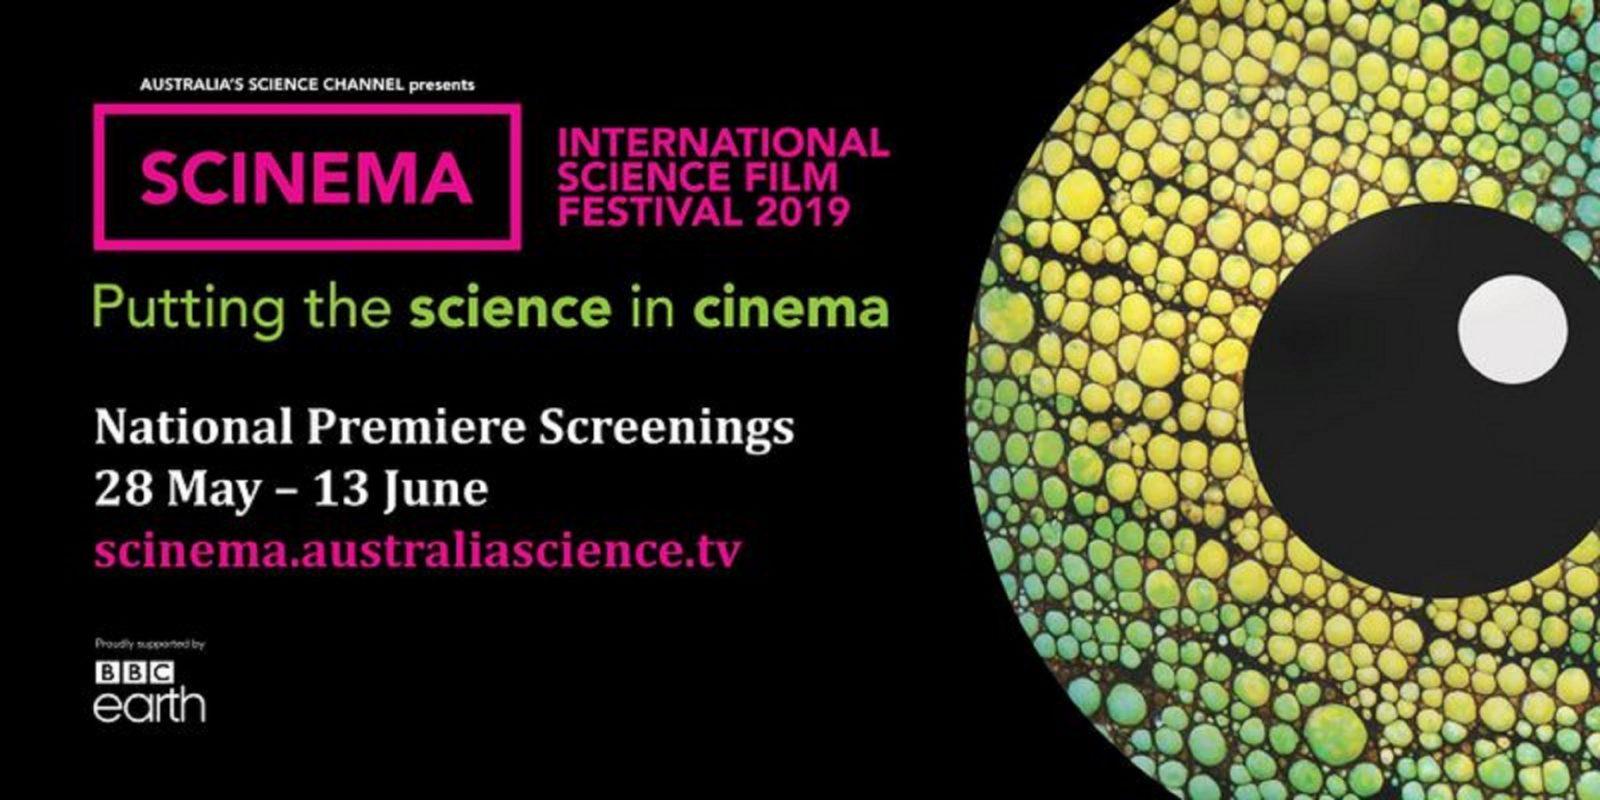 SCINEMA International Film Festival. National premiere screenings 28 May - 13 June